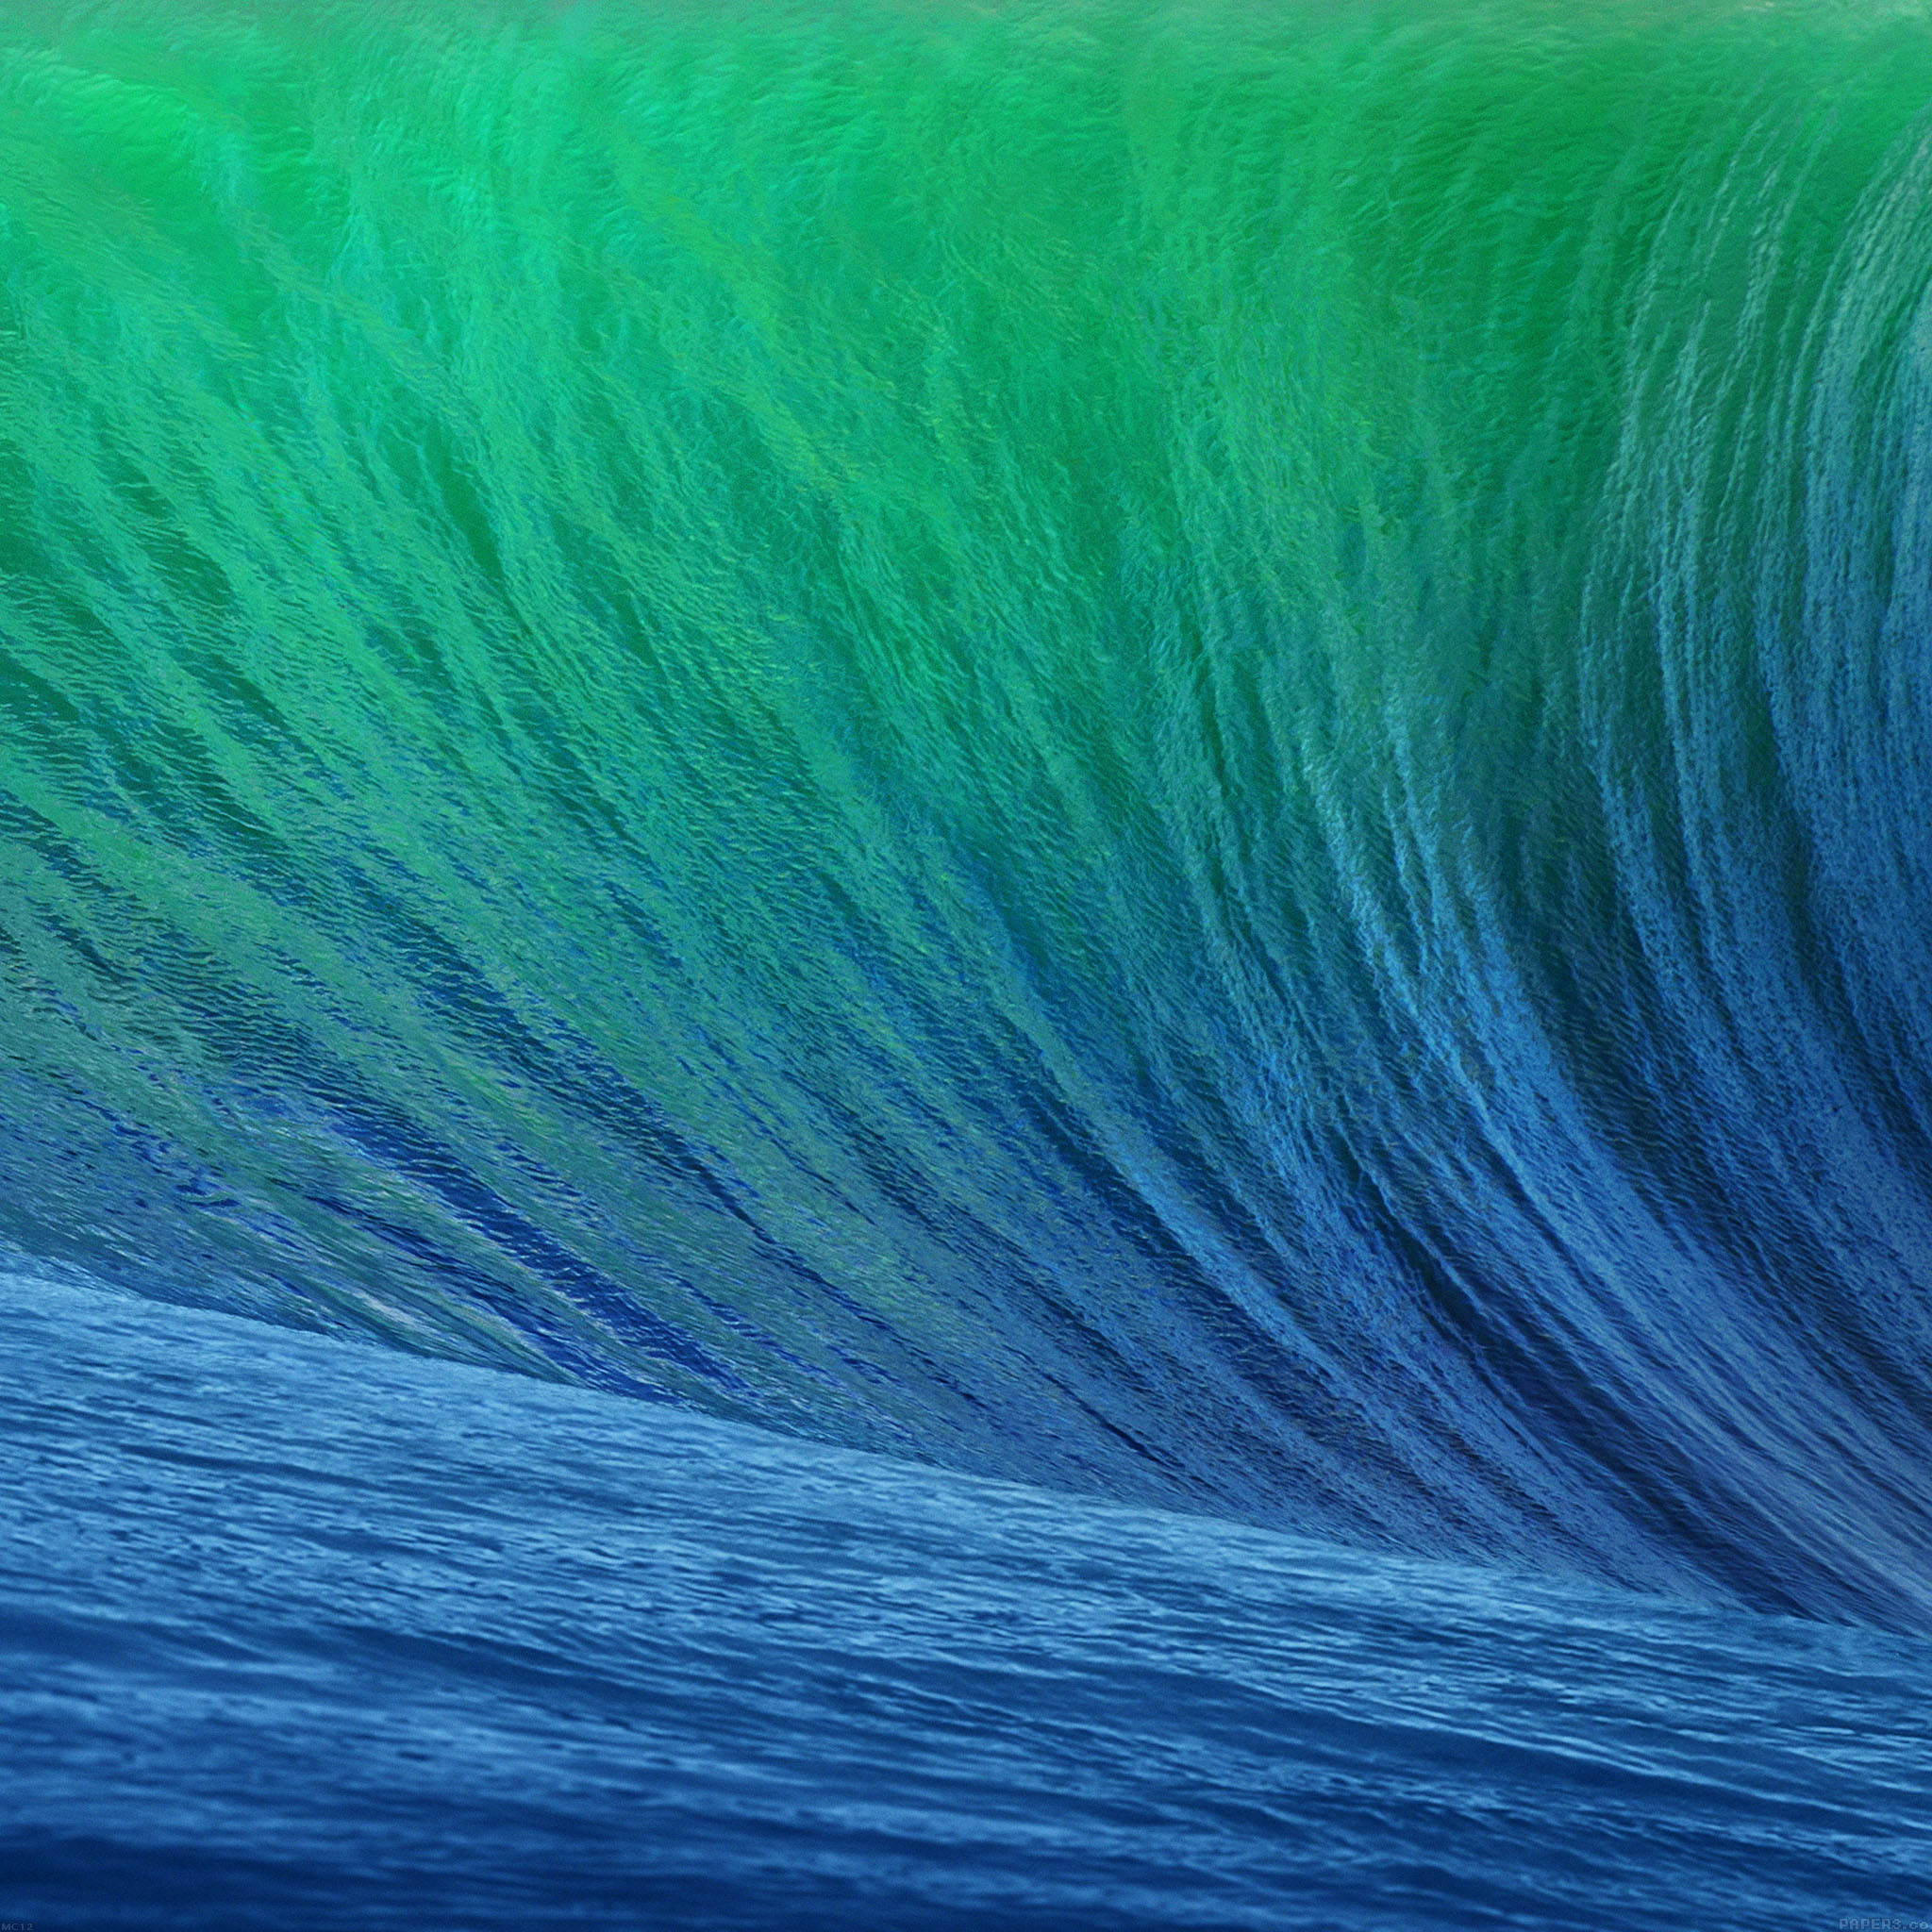 Fantastic Wallpaper Macbook Wave - papers  Trends_4097100.jpg